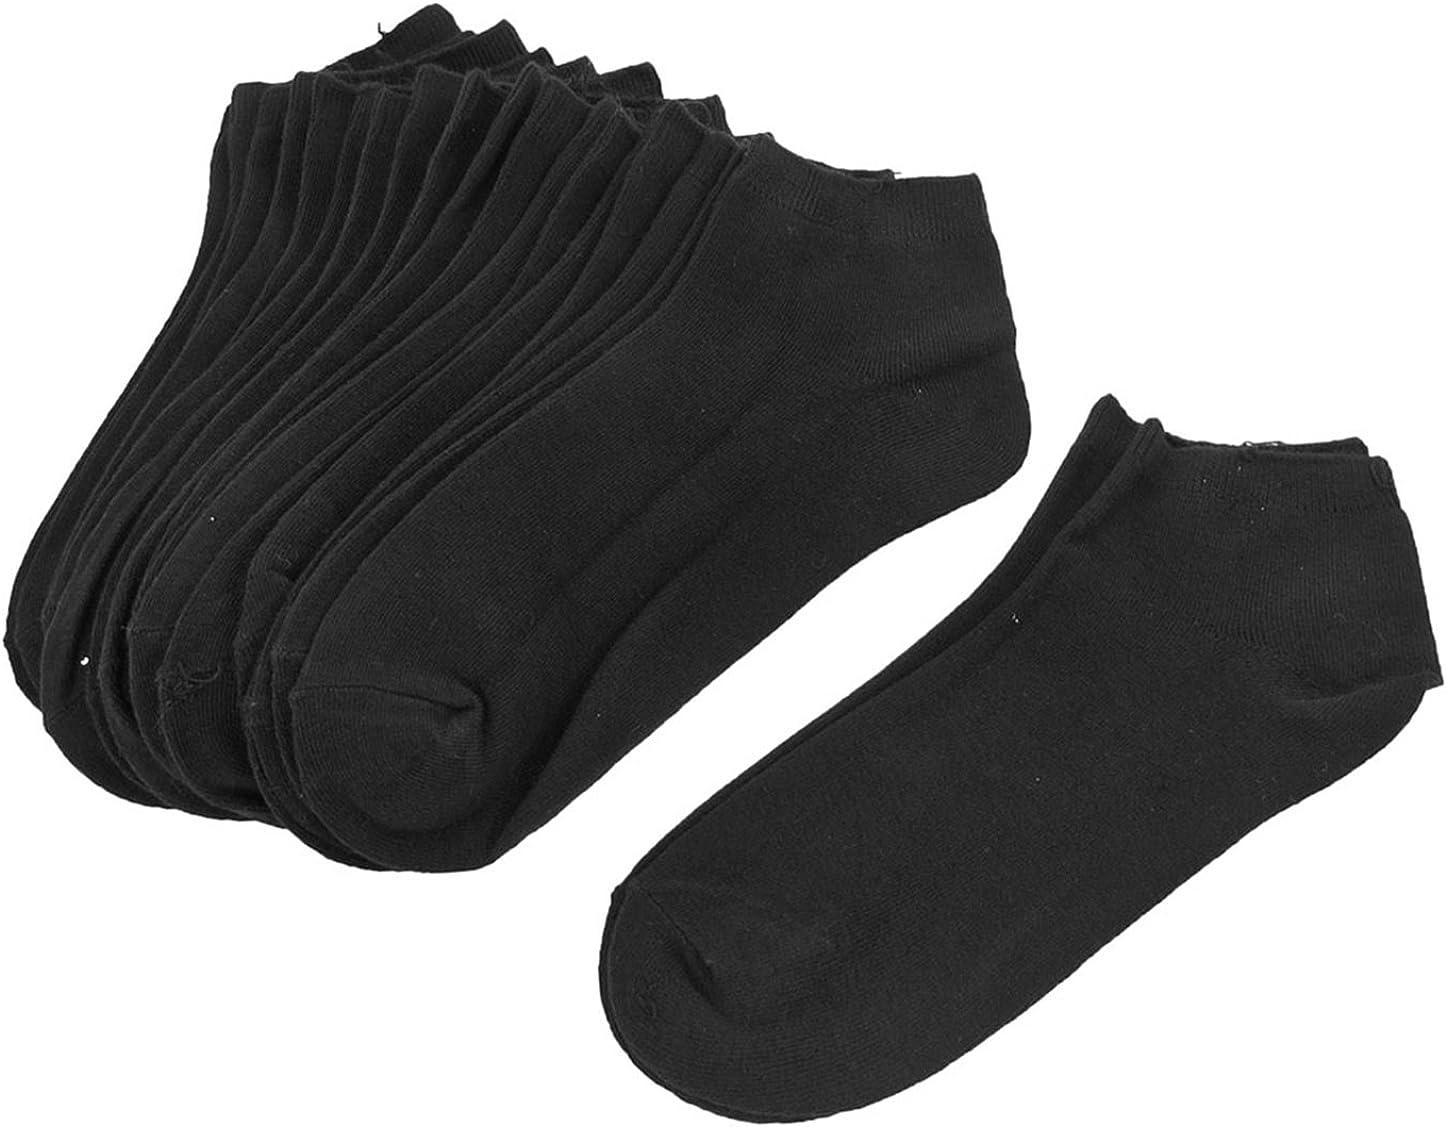 Allegra K 10 Pairs Lady Short Low Cut Sports Elastic Socks Black